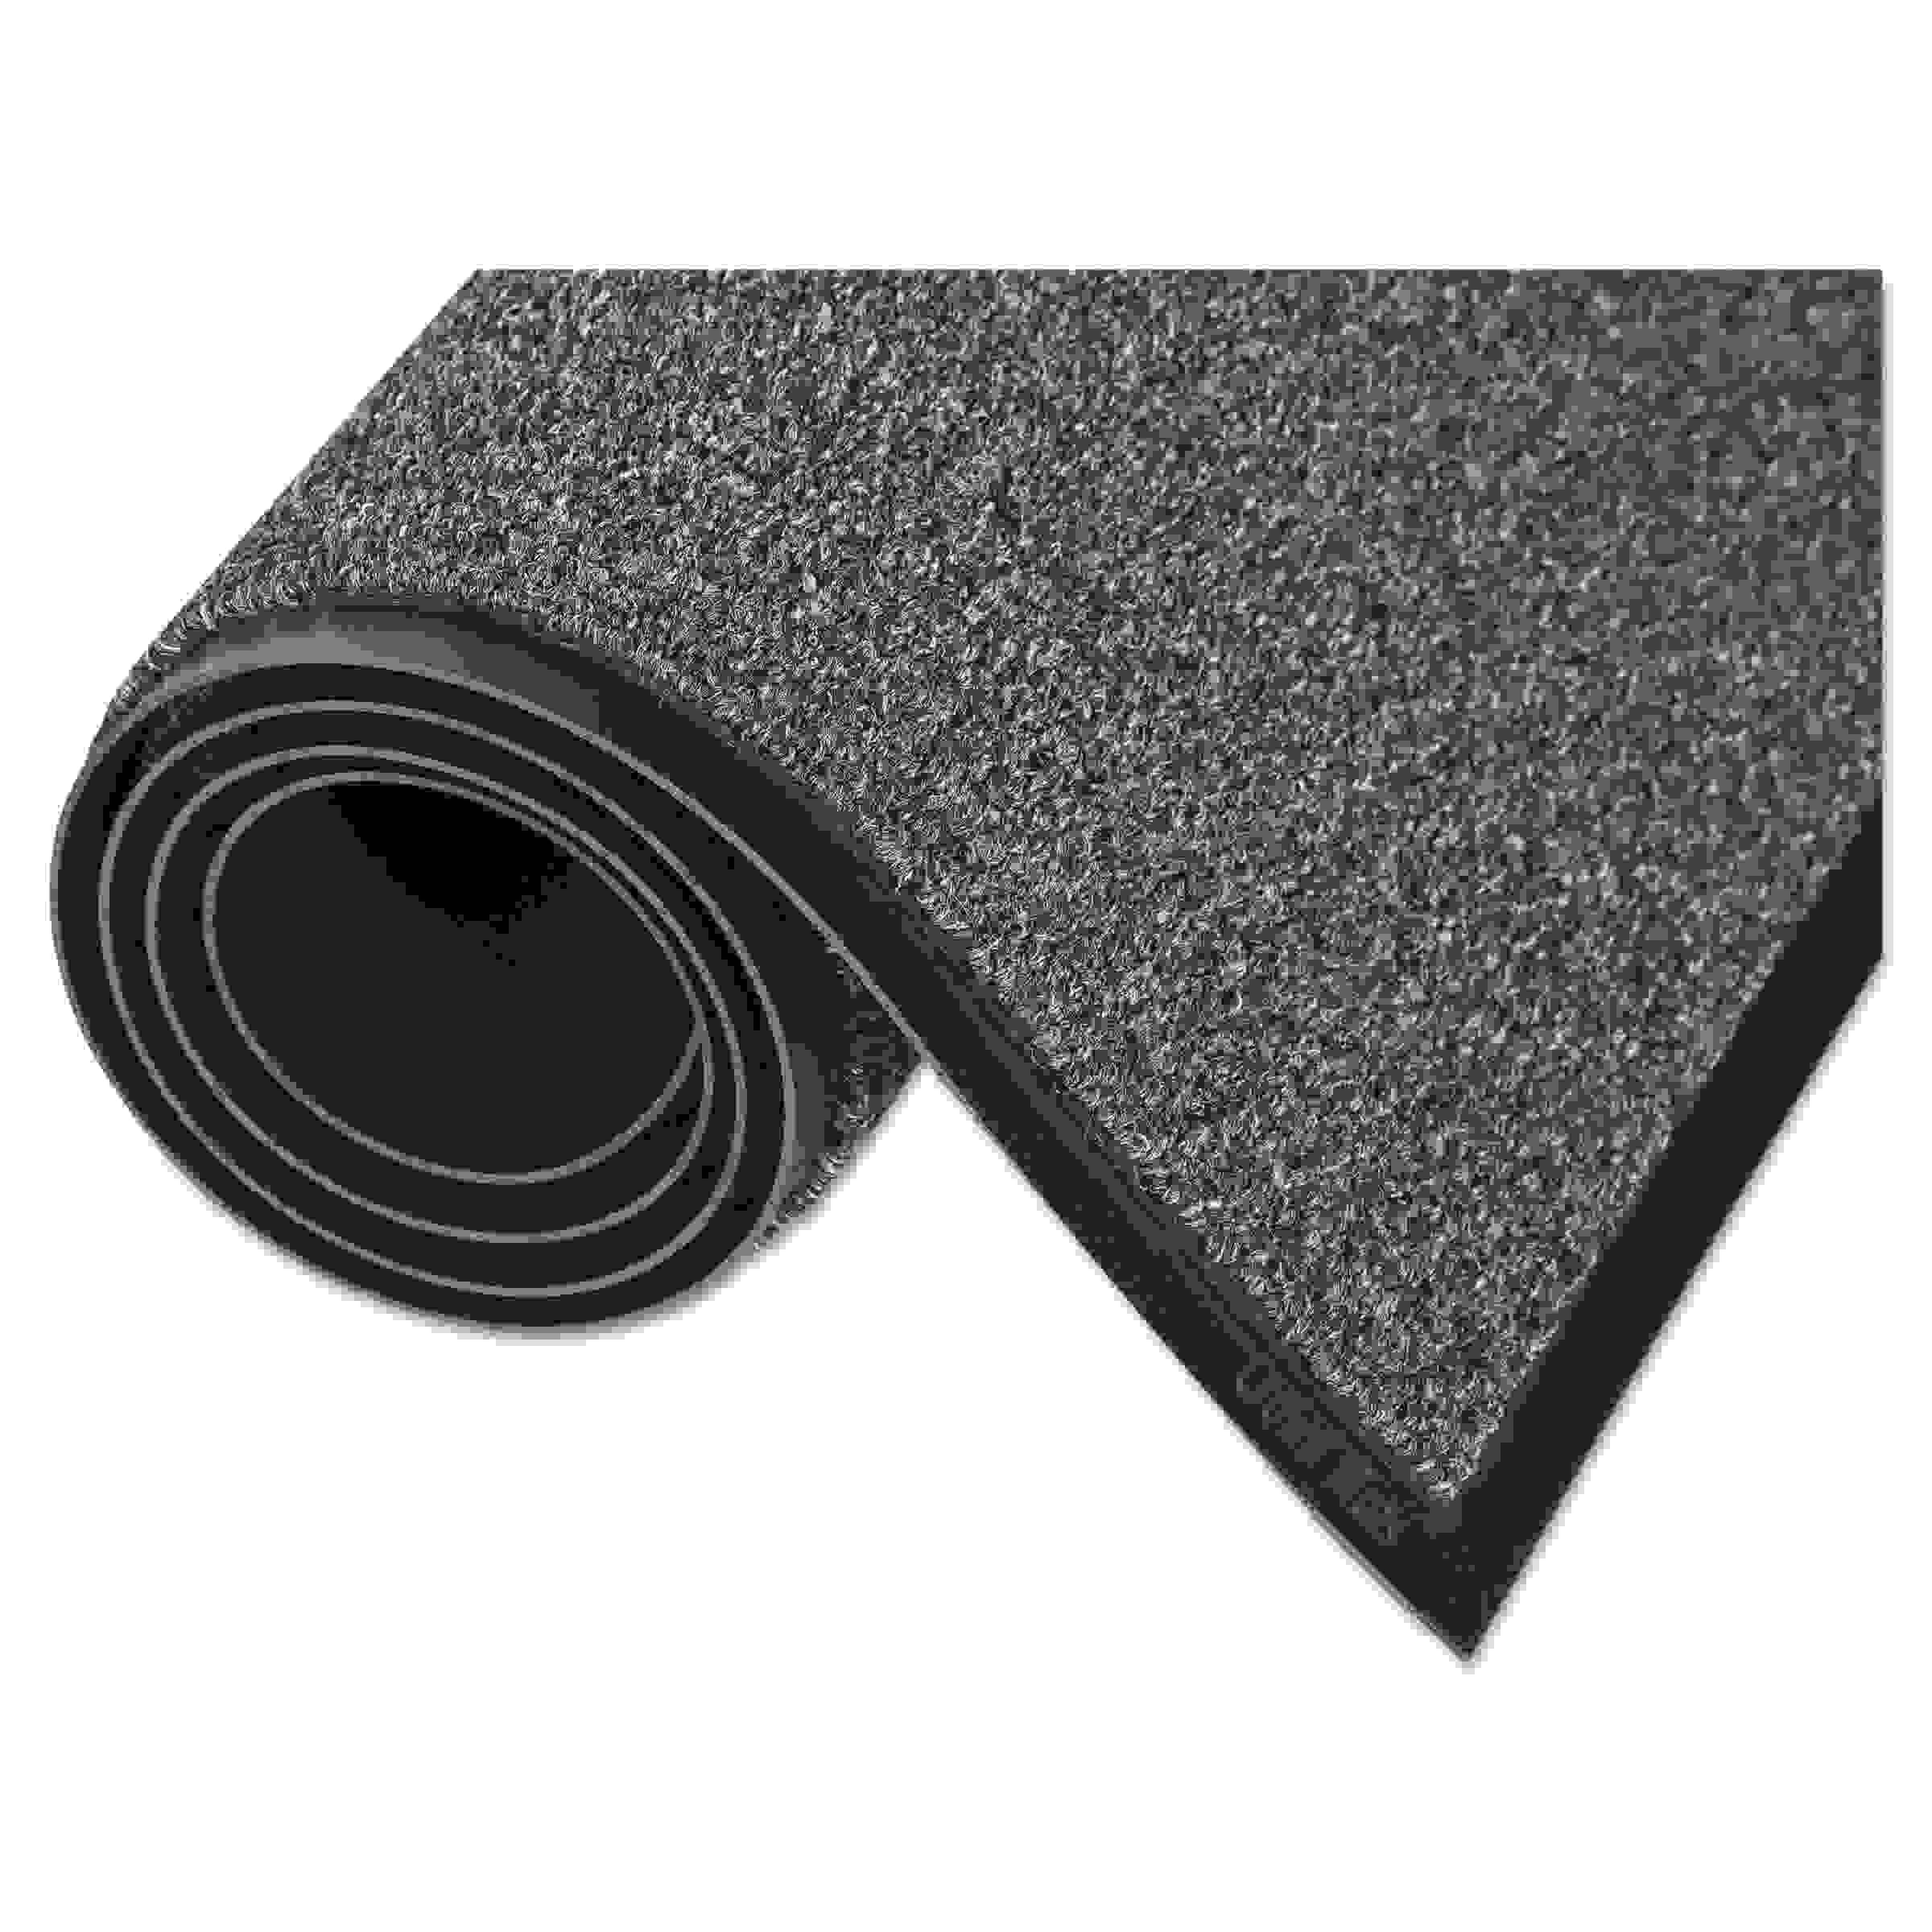 Walk-A-Way Indoor Wiper Mat, Olefin, 36 x 60, Gray